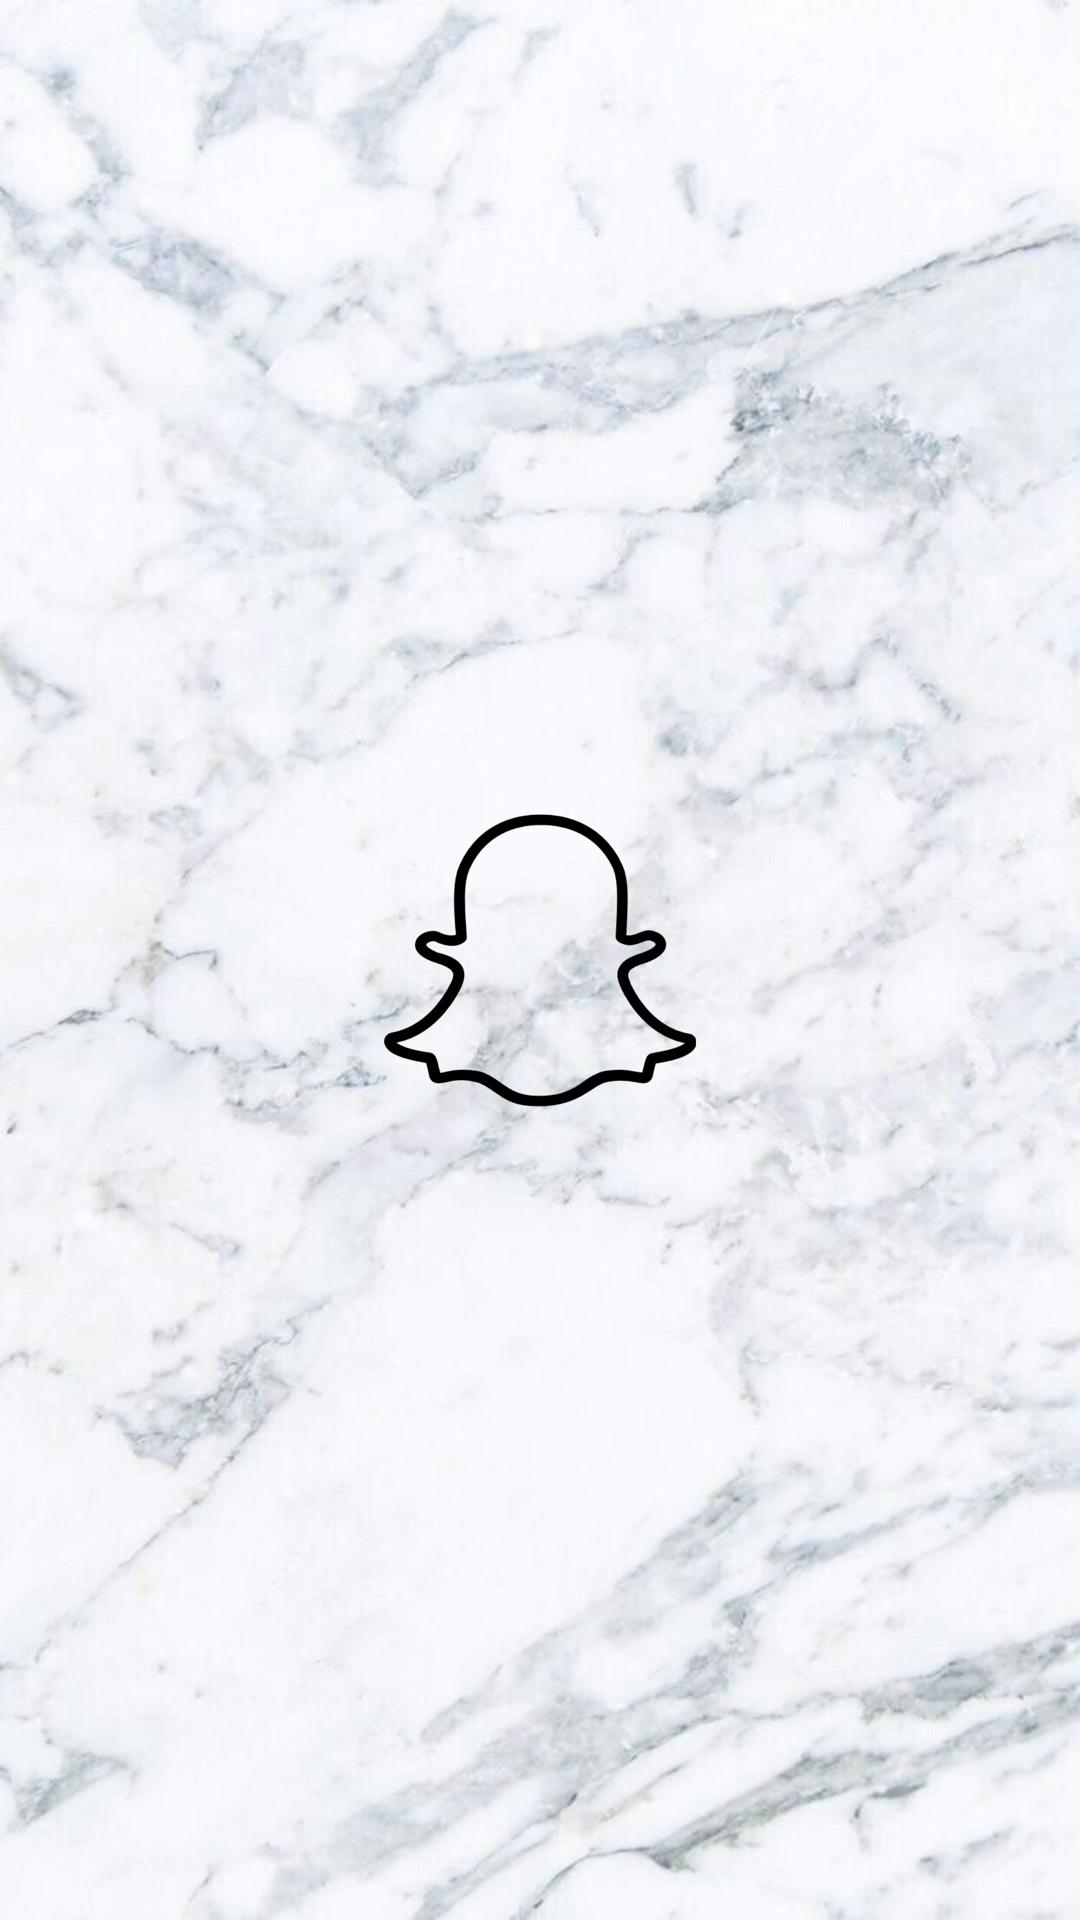 Tiktok Logo Aesthetic In 2020 Snapchat Icon Snapchat Logo Instagram Logo